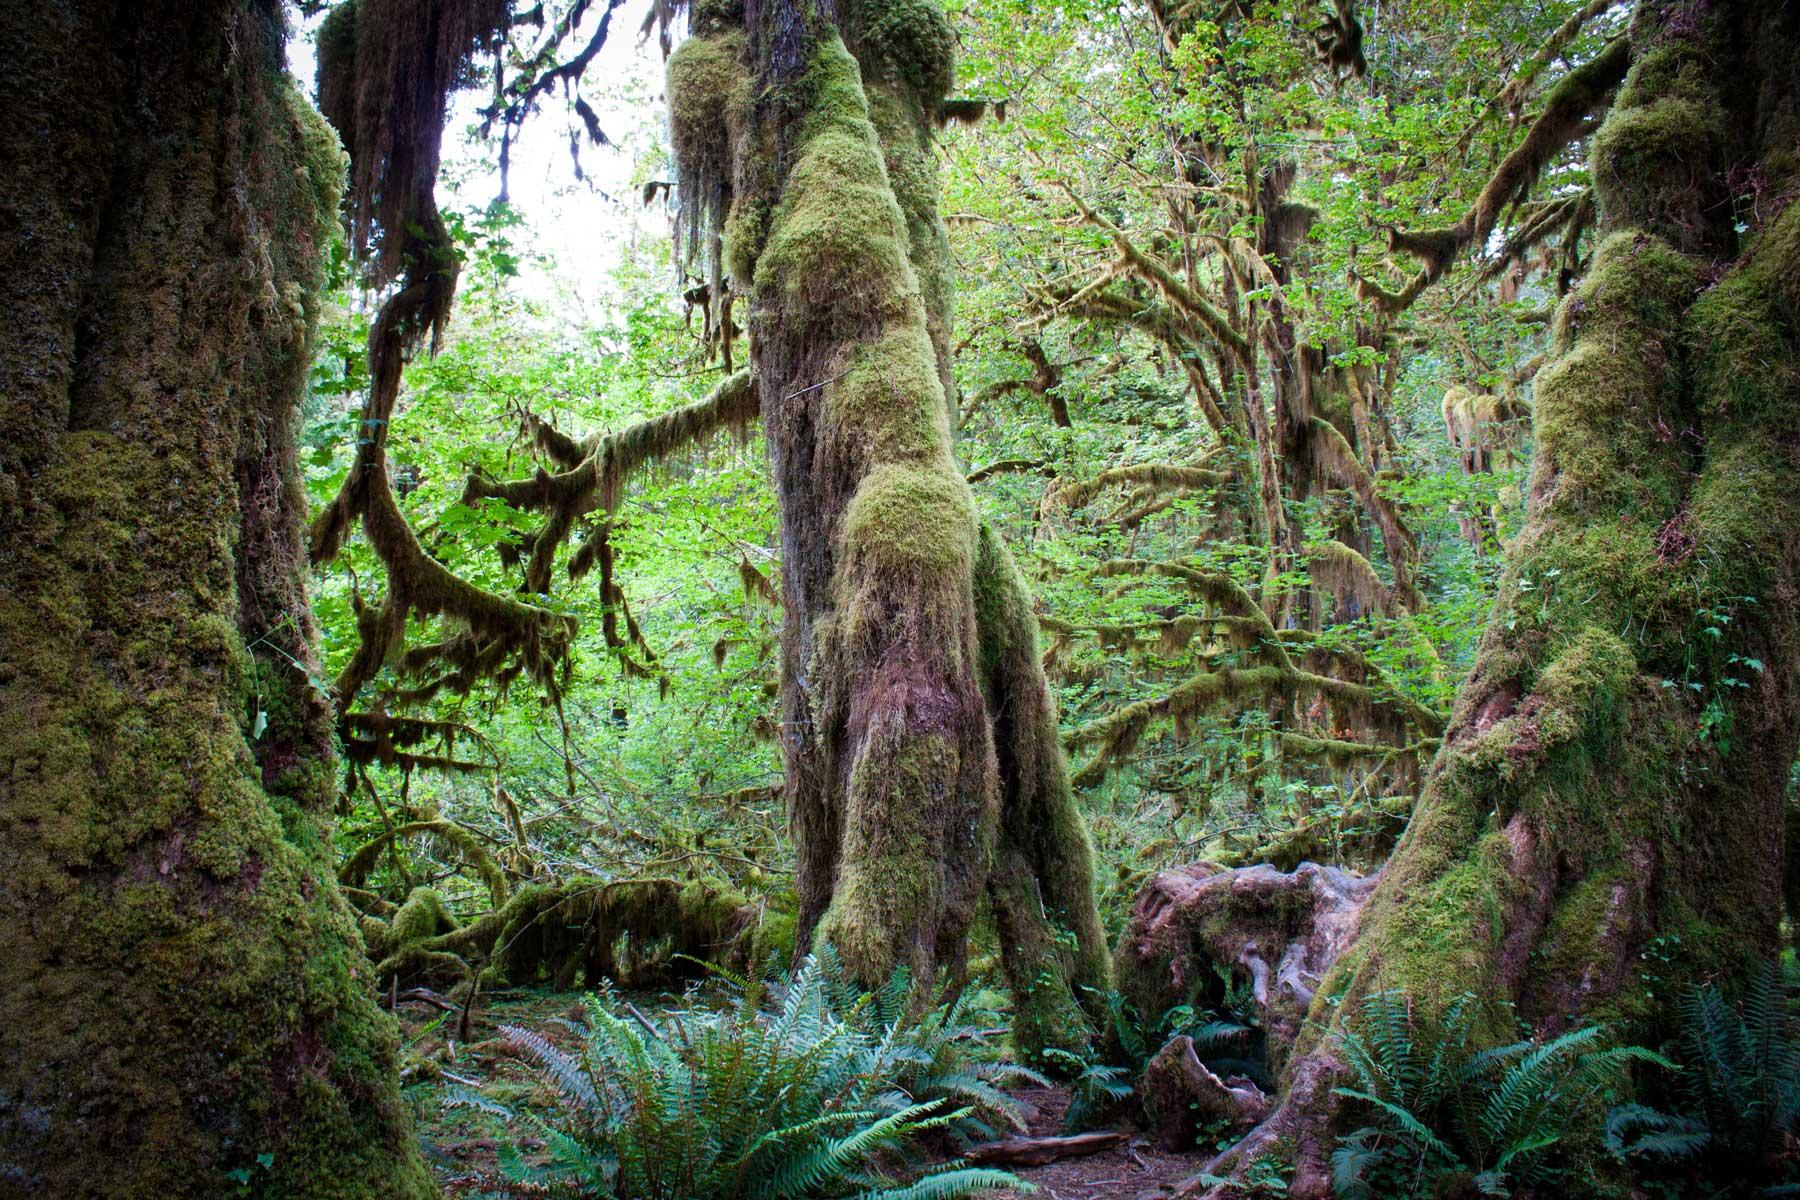 Hall of Mosses on helppo kävelyreitti Hoh'n sademetsässä Olympic National Parkissa. (c) Abhinaba Basu/Flickr.com, CC 2.0